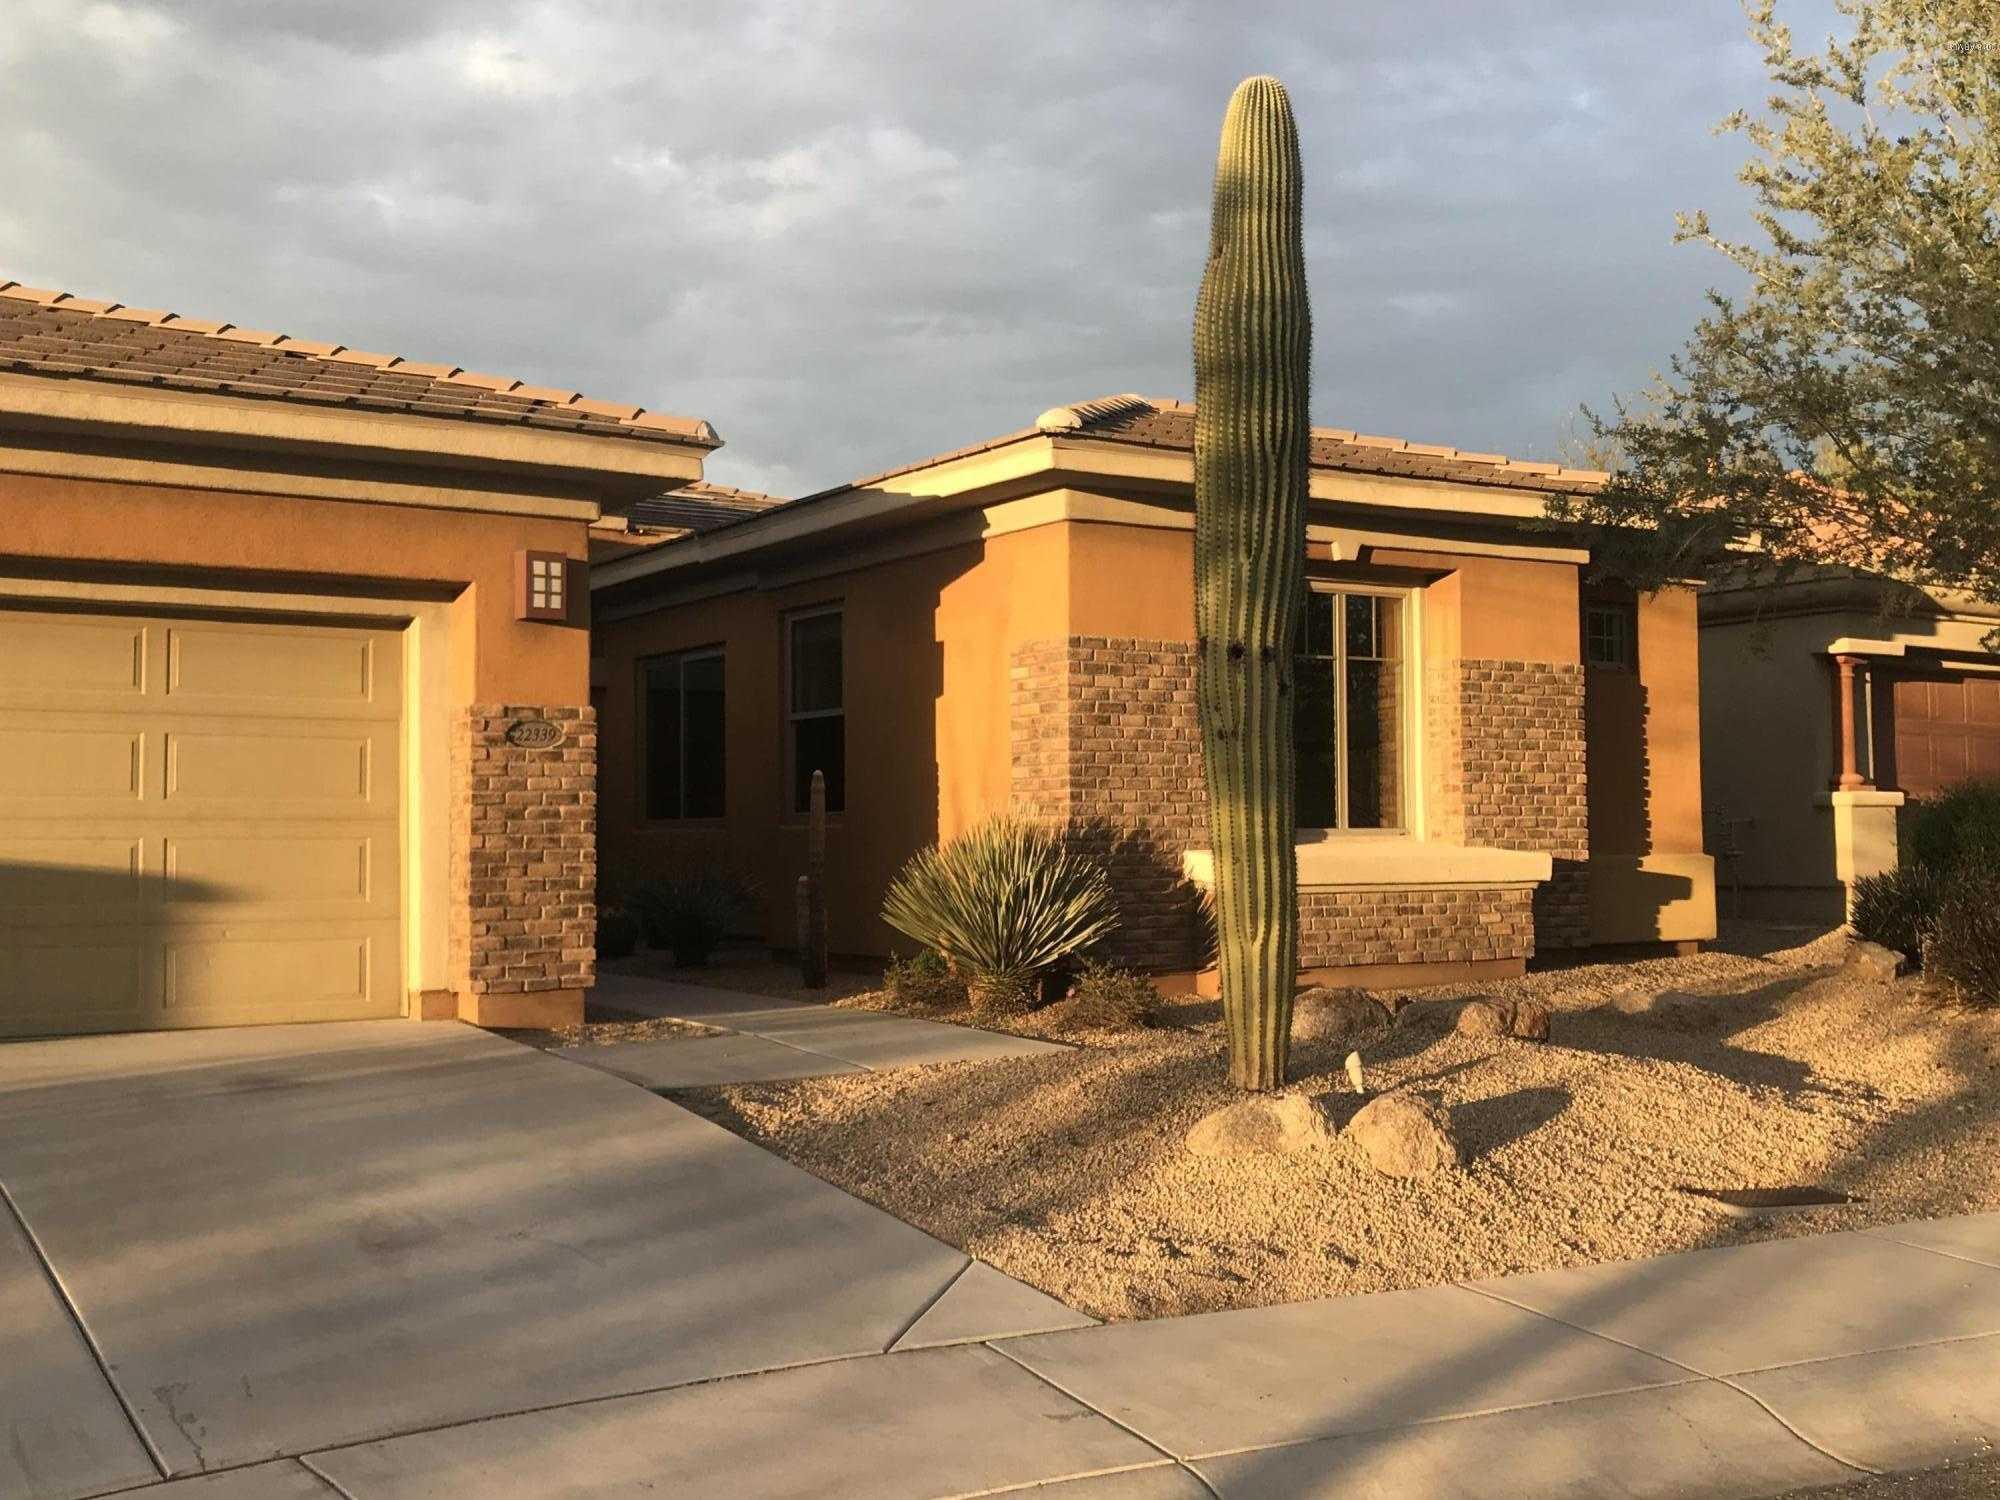 $2,650 - 2Br/3Ba - Home for Sale in Aviano, Phoenix